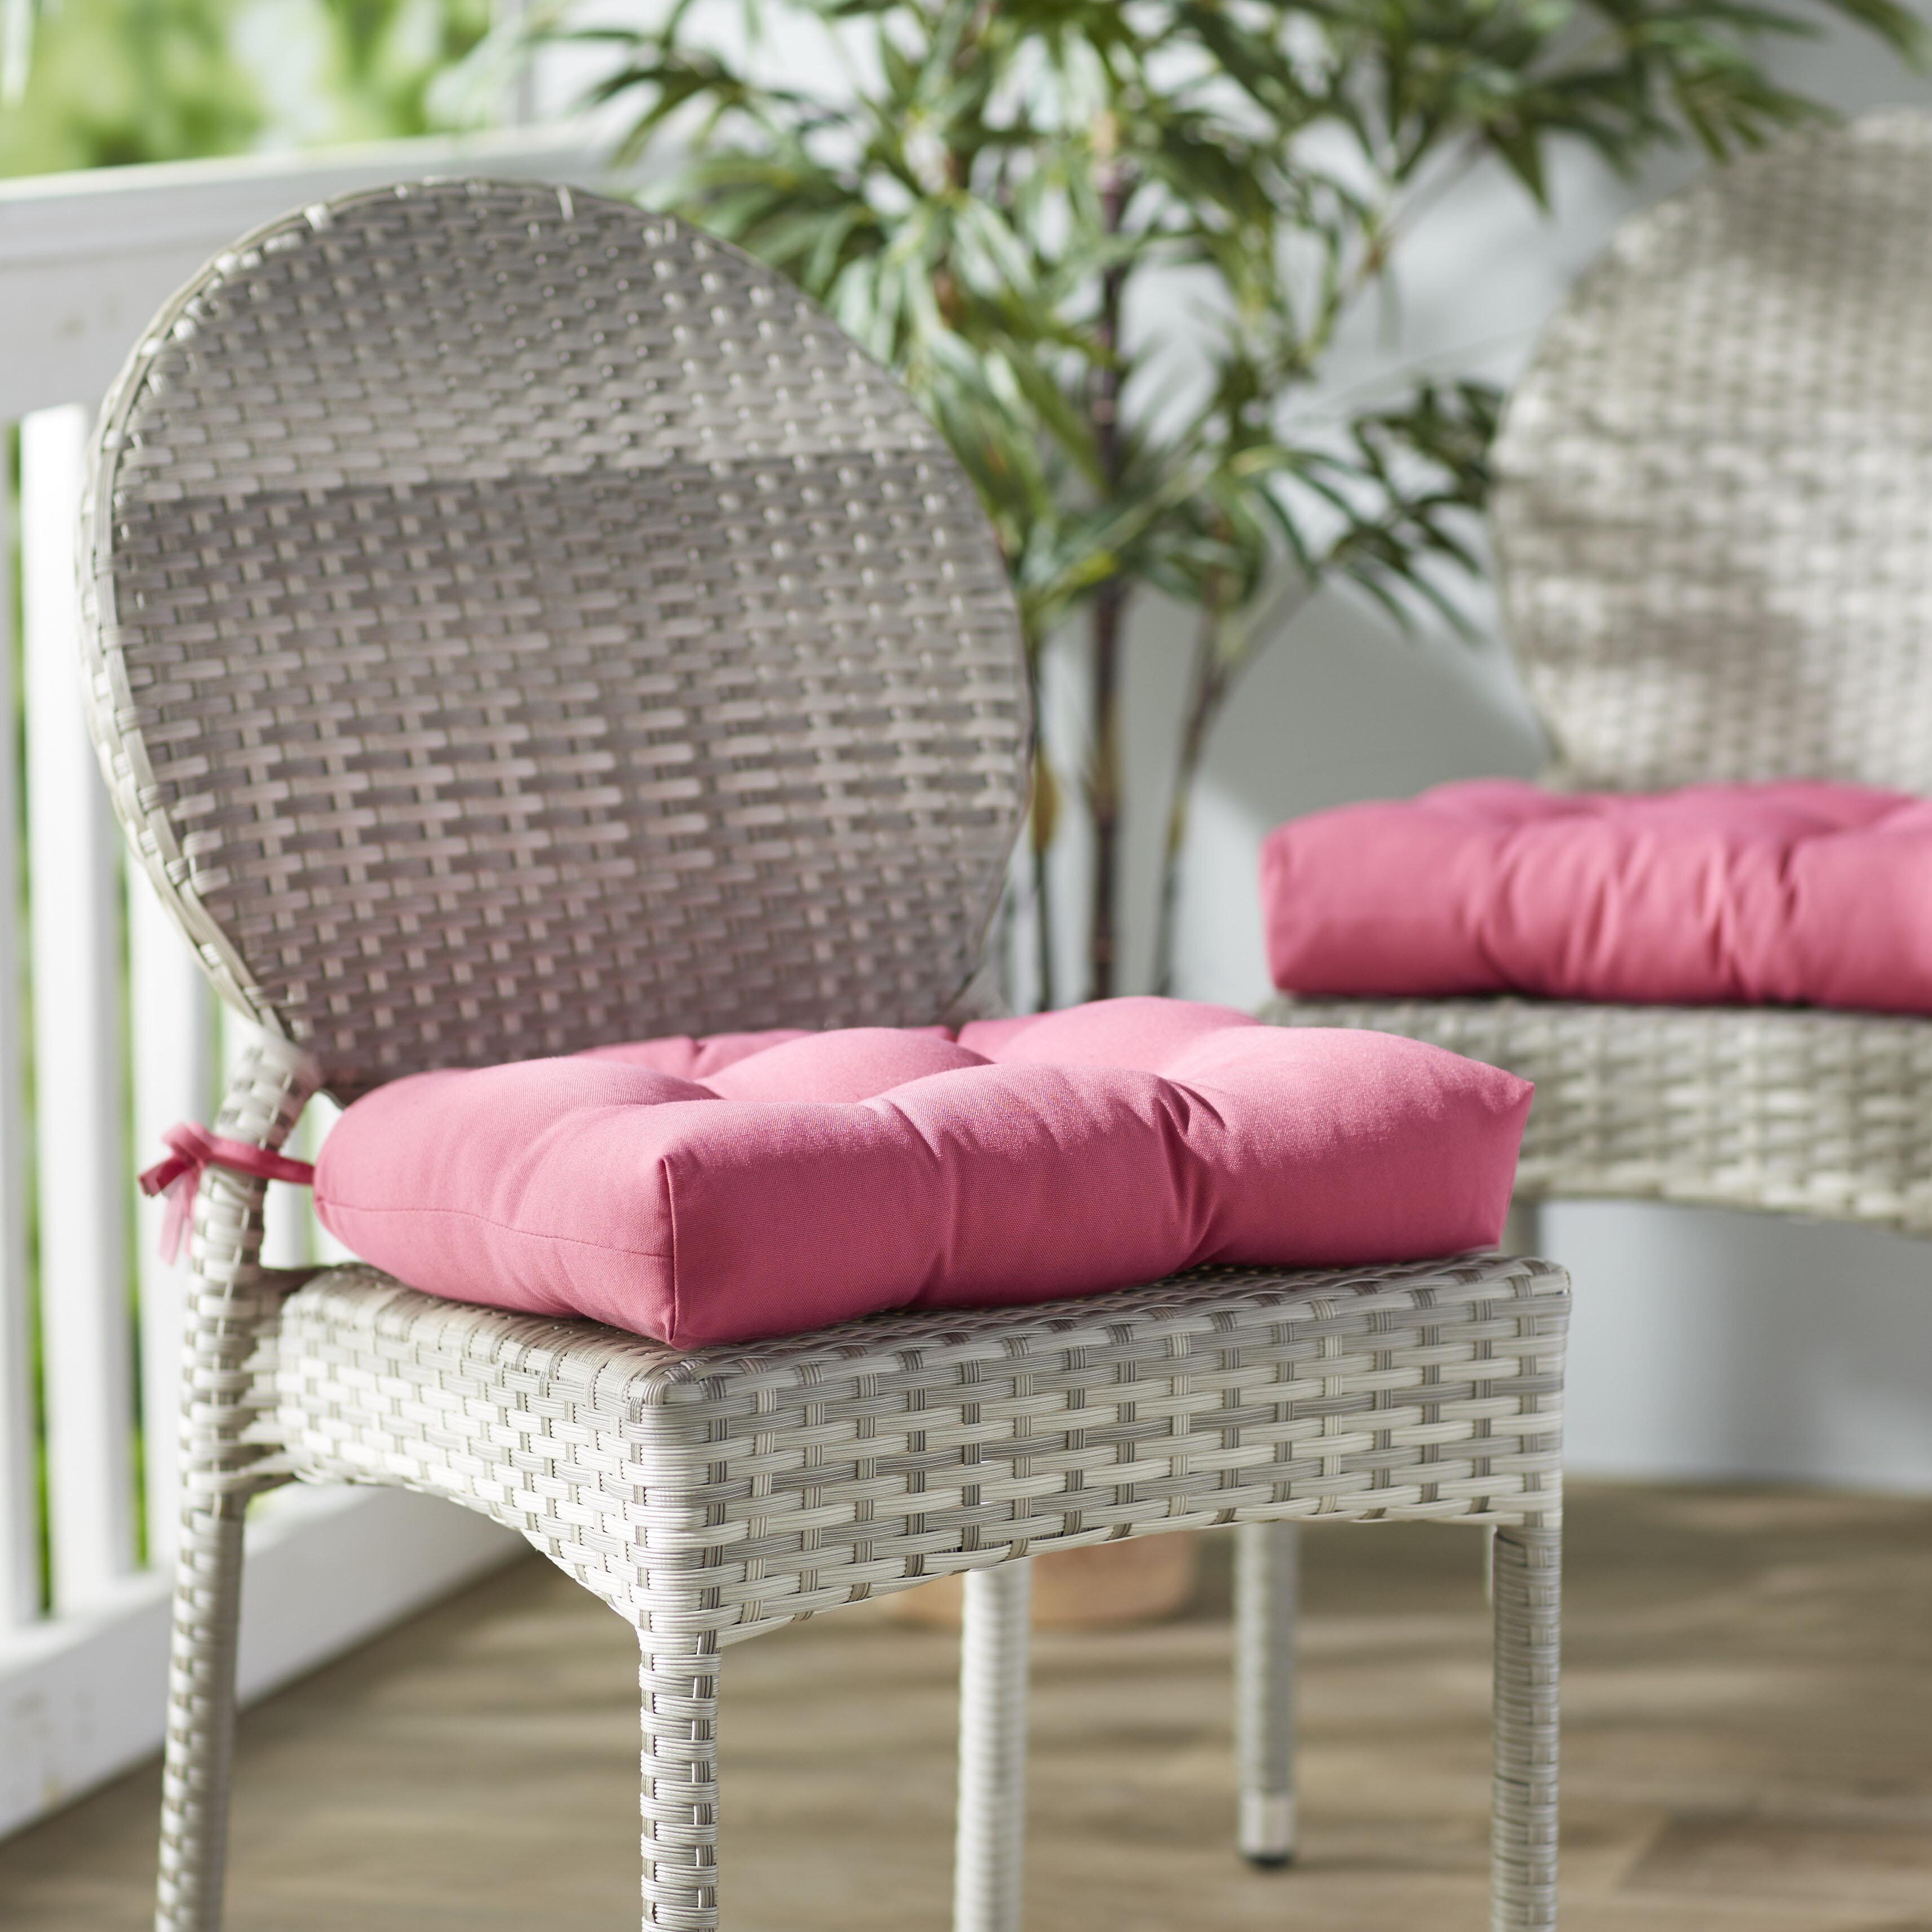 Dining Chair Patio Furniture Cushions You Ll Love In 2021 Wayfair